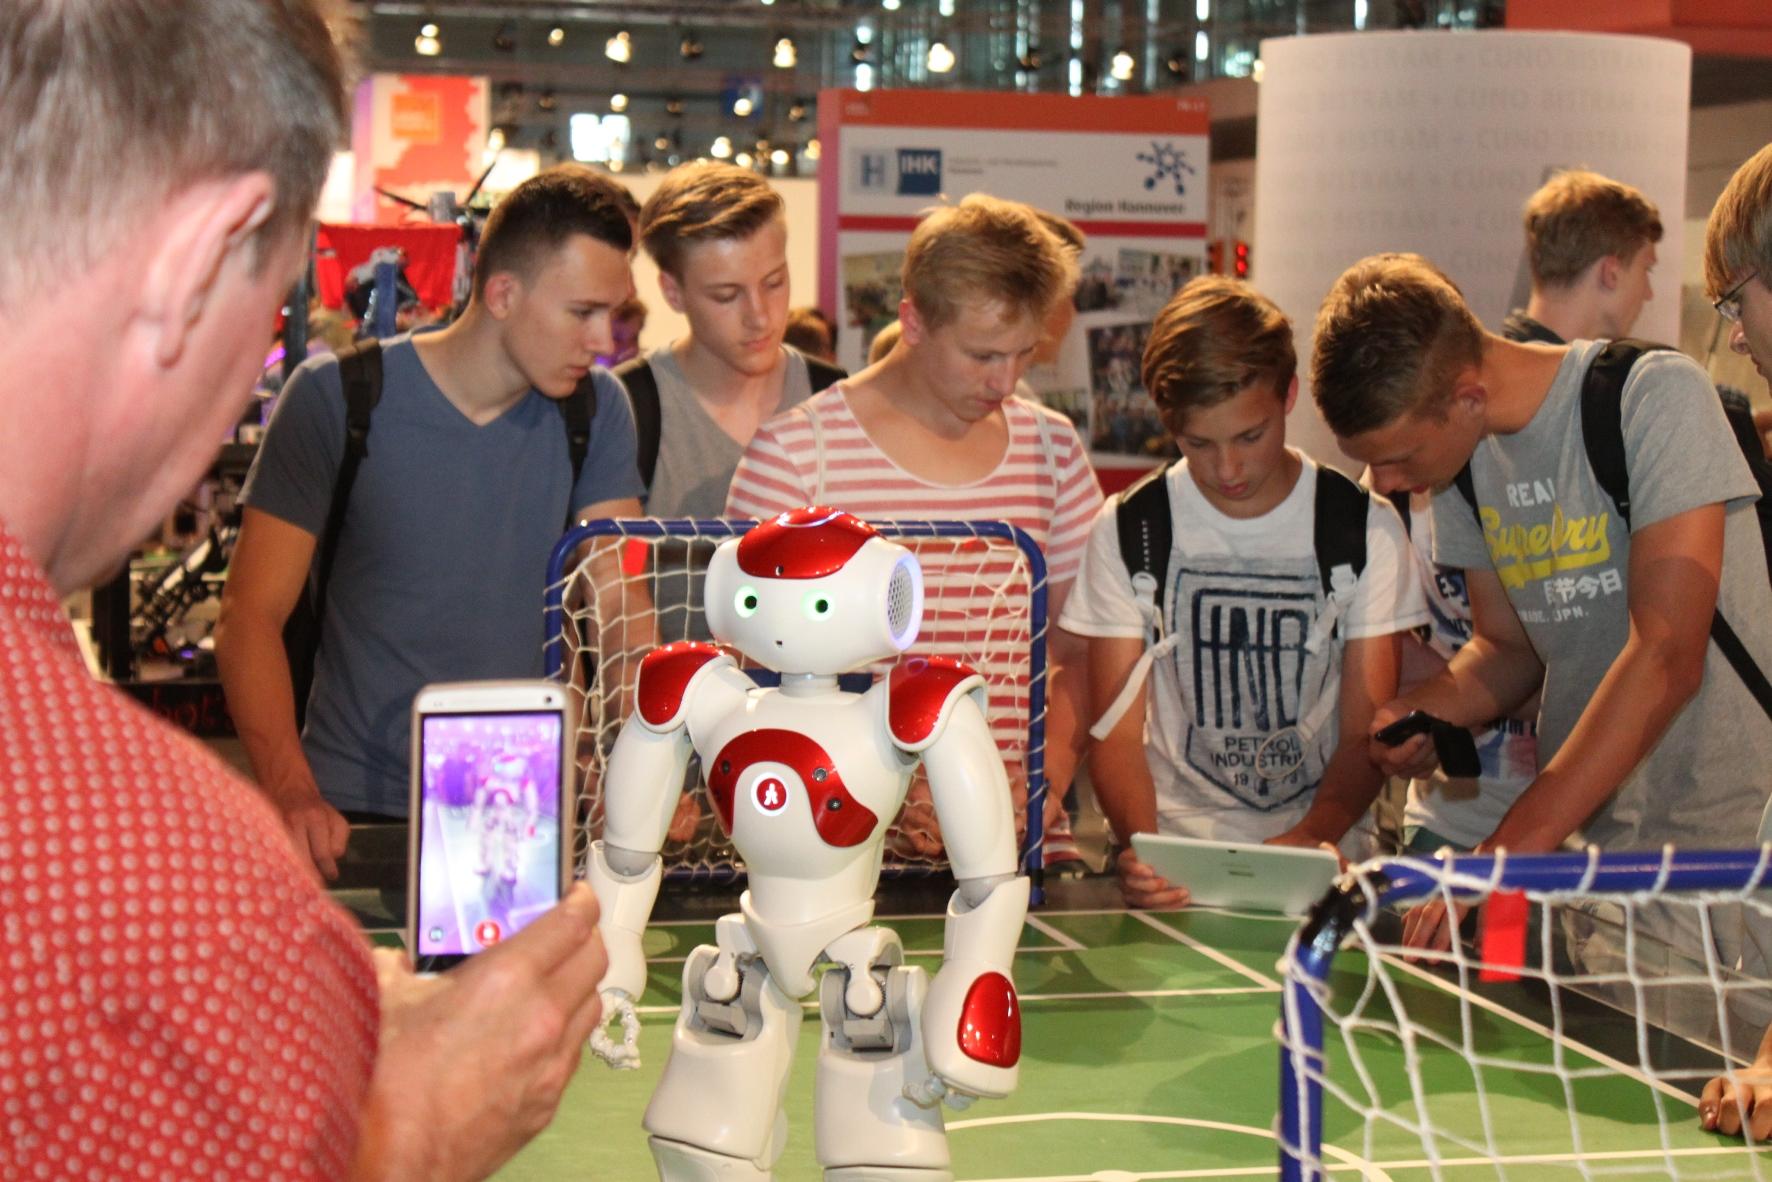 "(2) Schüler informieren sich über den Roboter ""NAO"" © IdeenExpo"